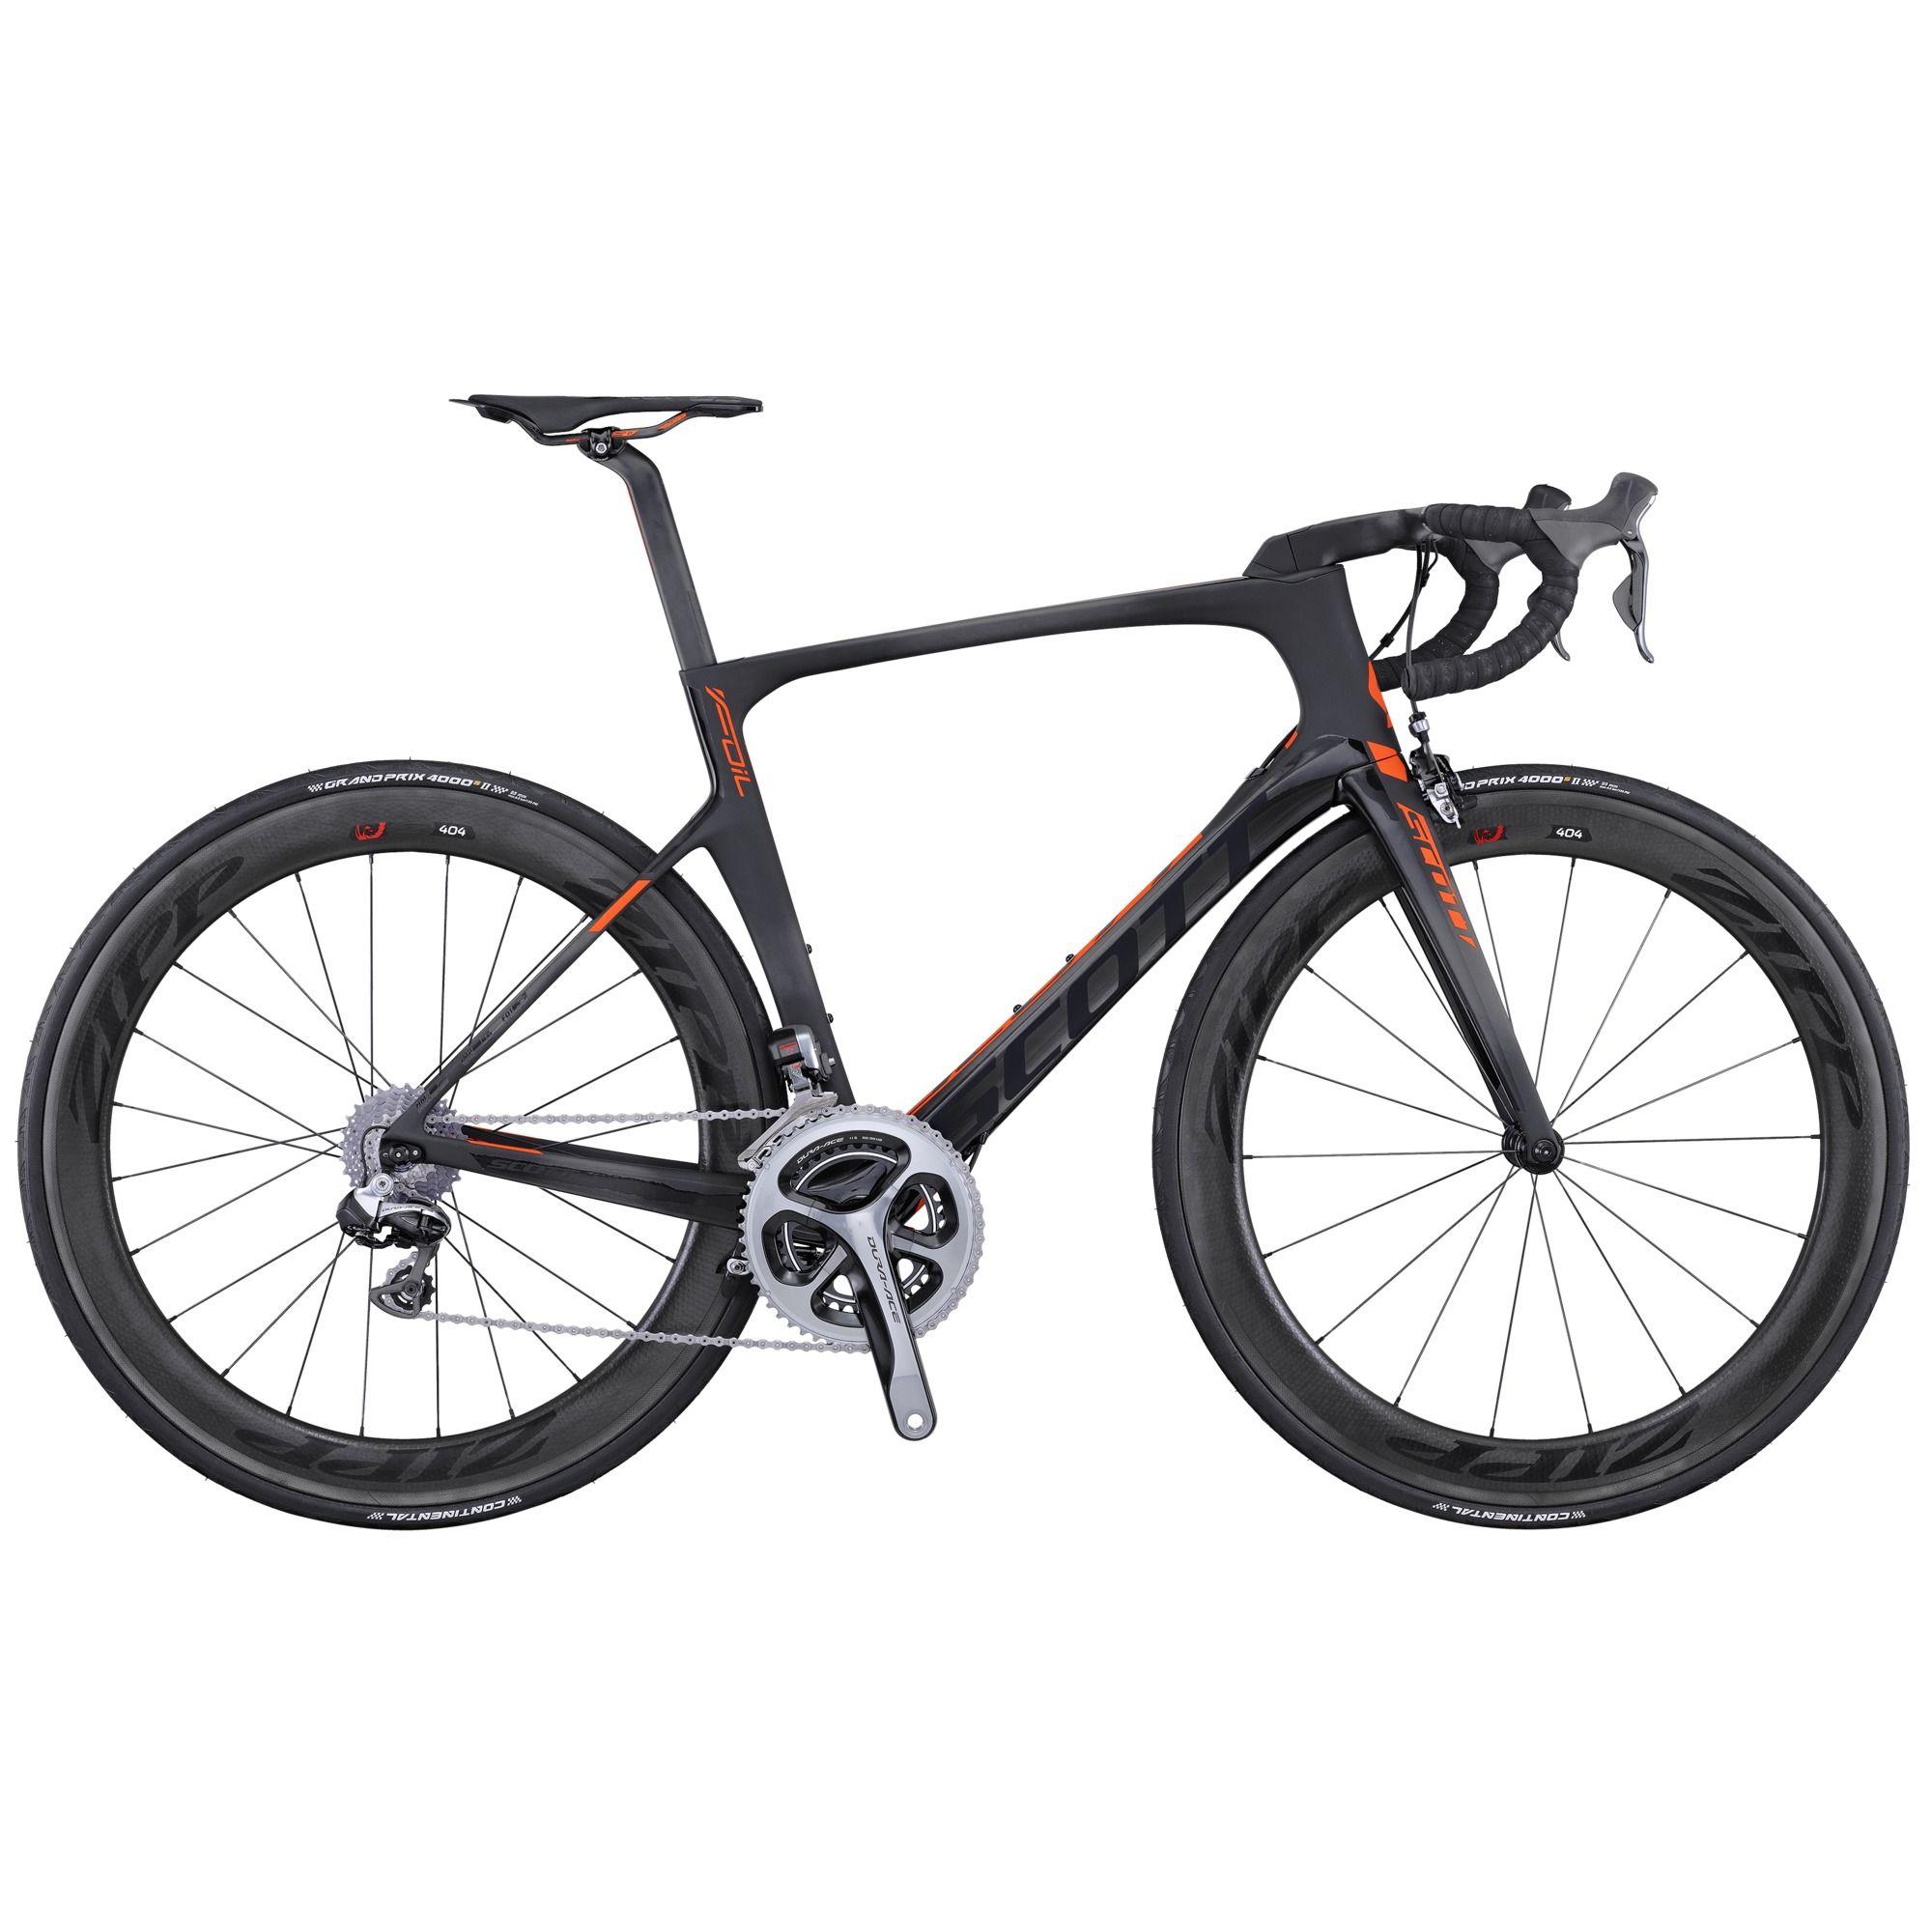 2016 Scott Foil Premium Carbon Road Bike Black Red Road Bike